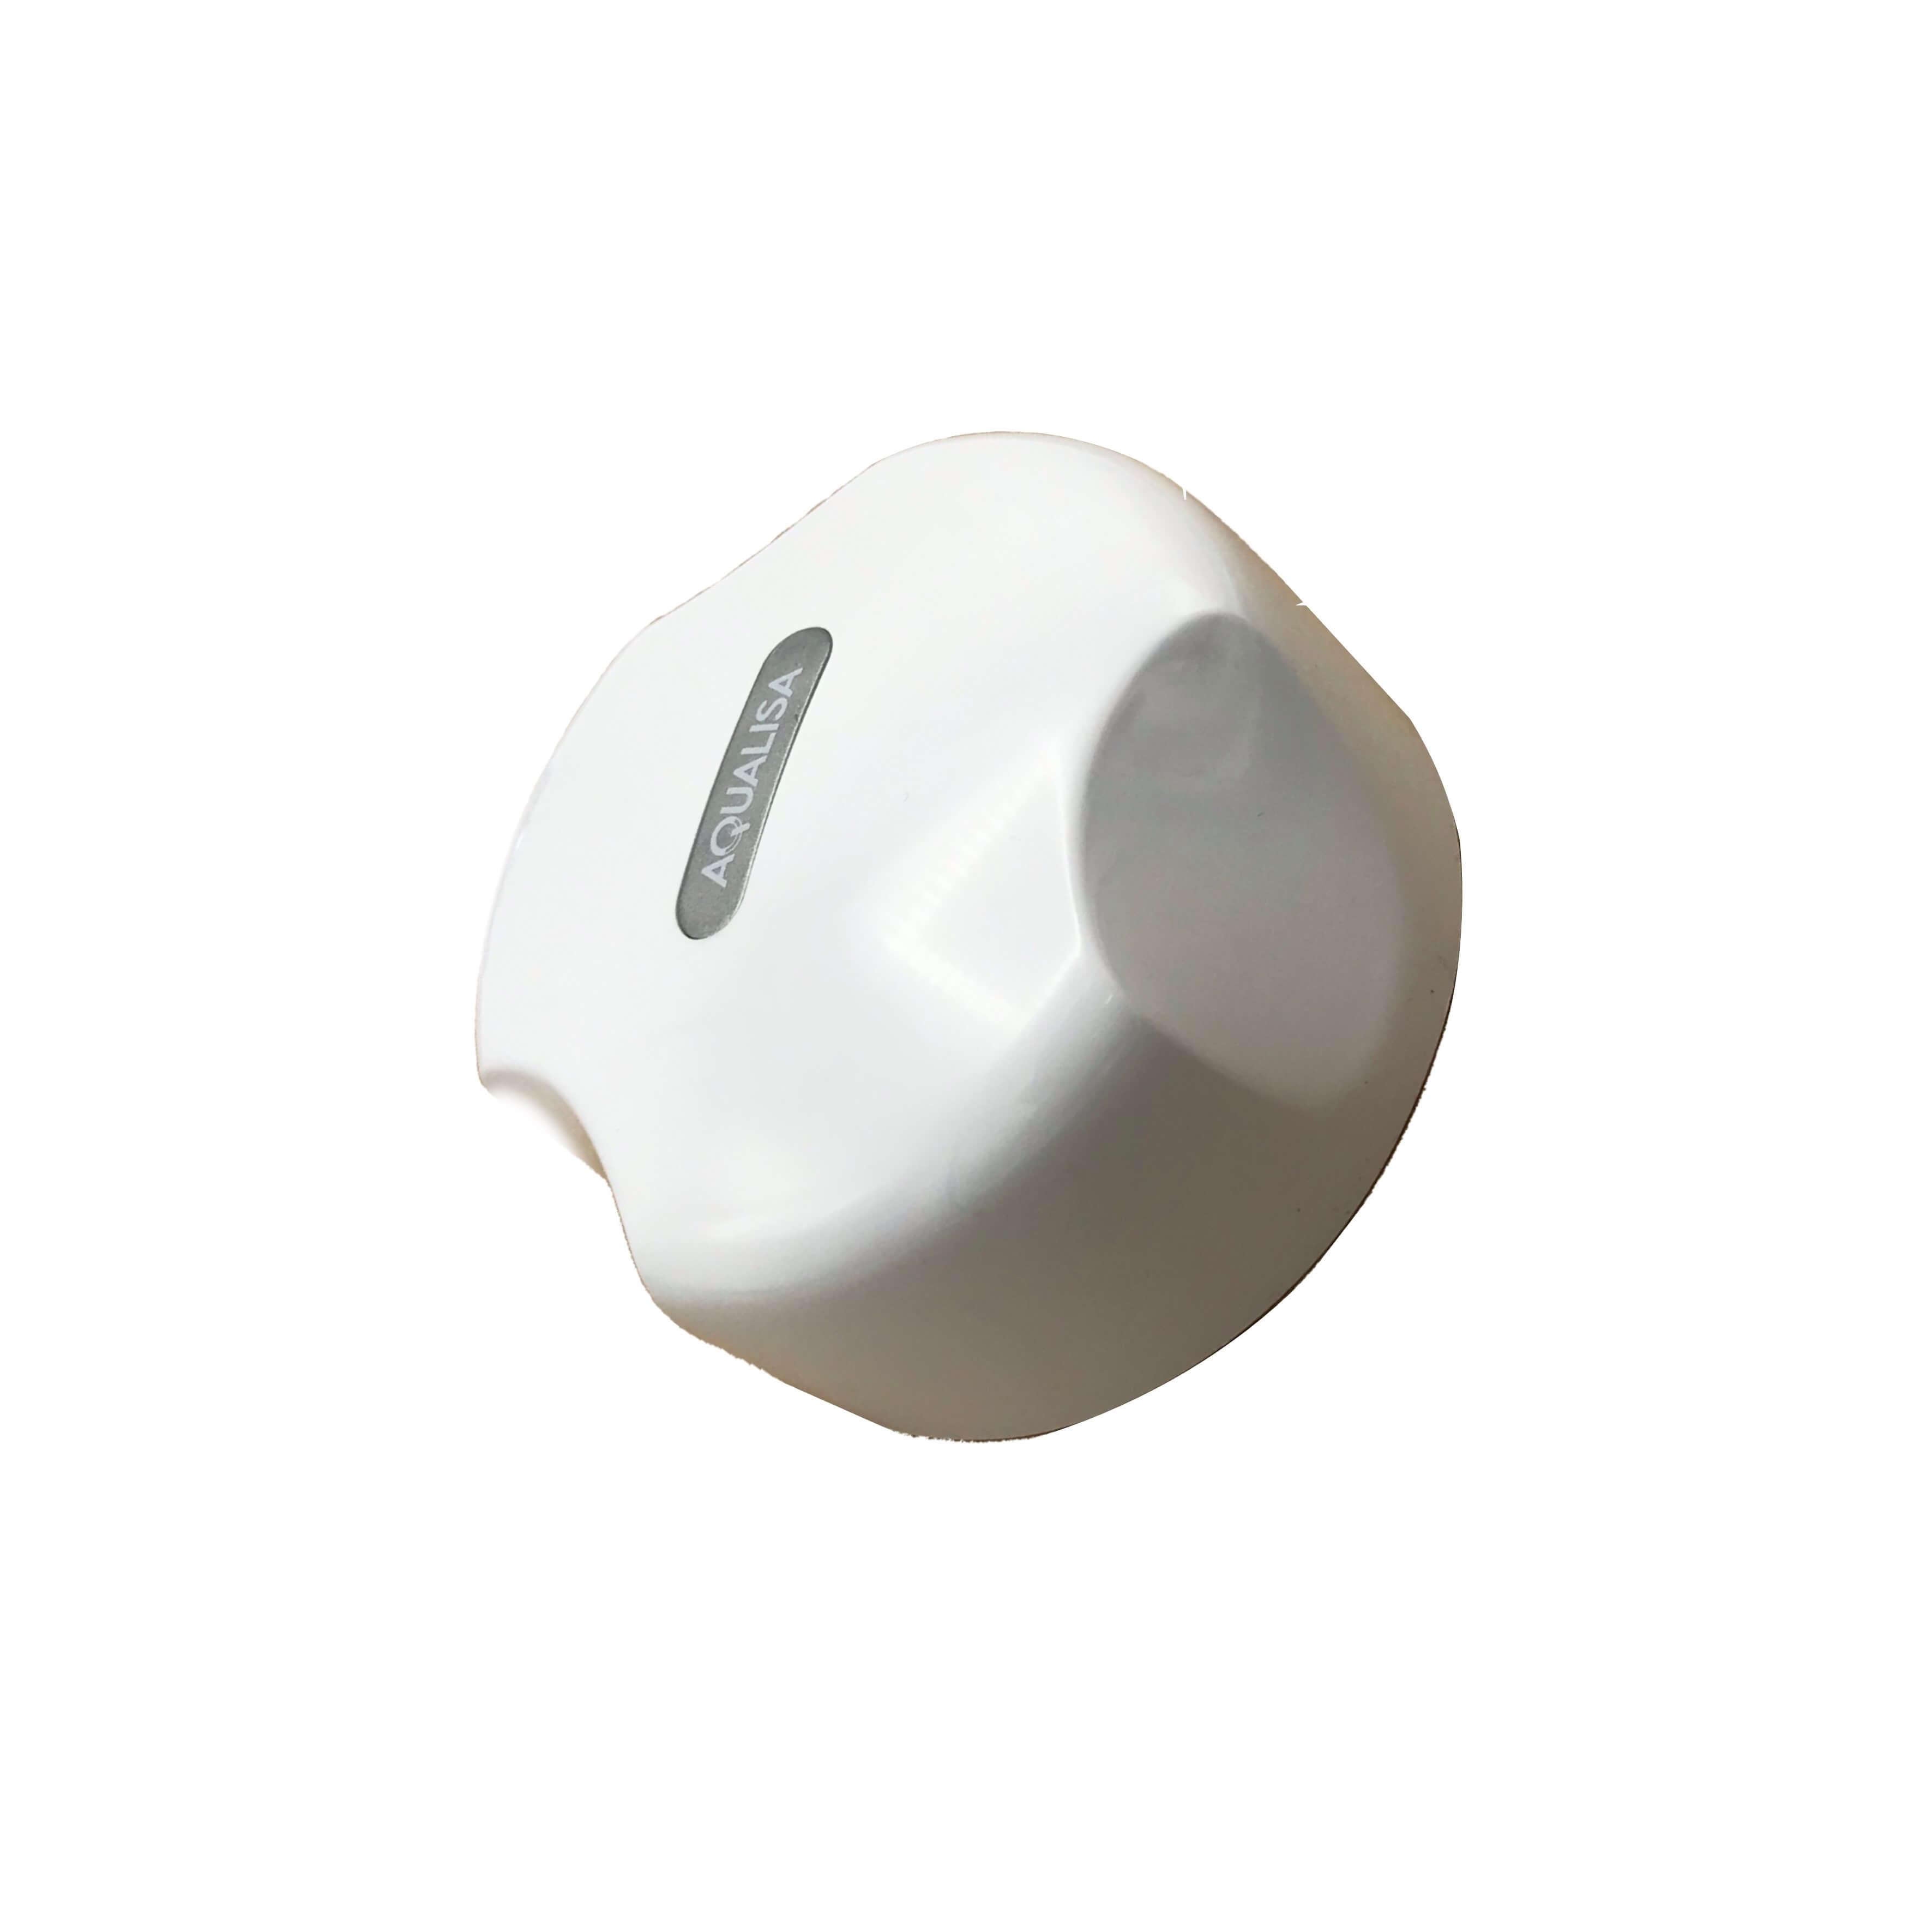 Aqualisa 605 Control Handle White 164401